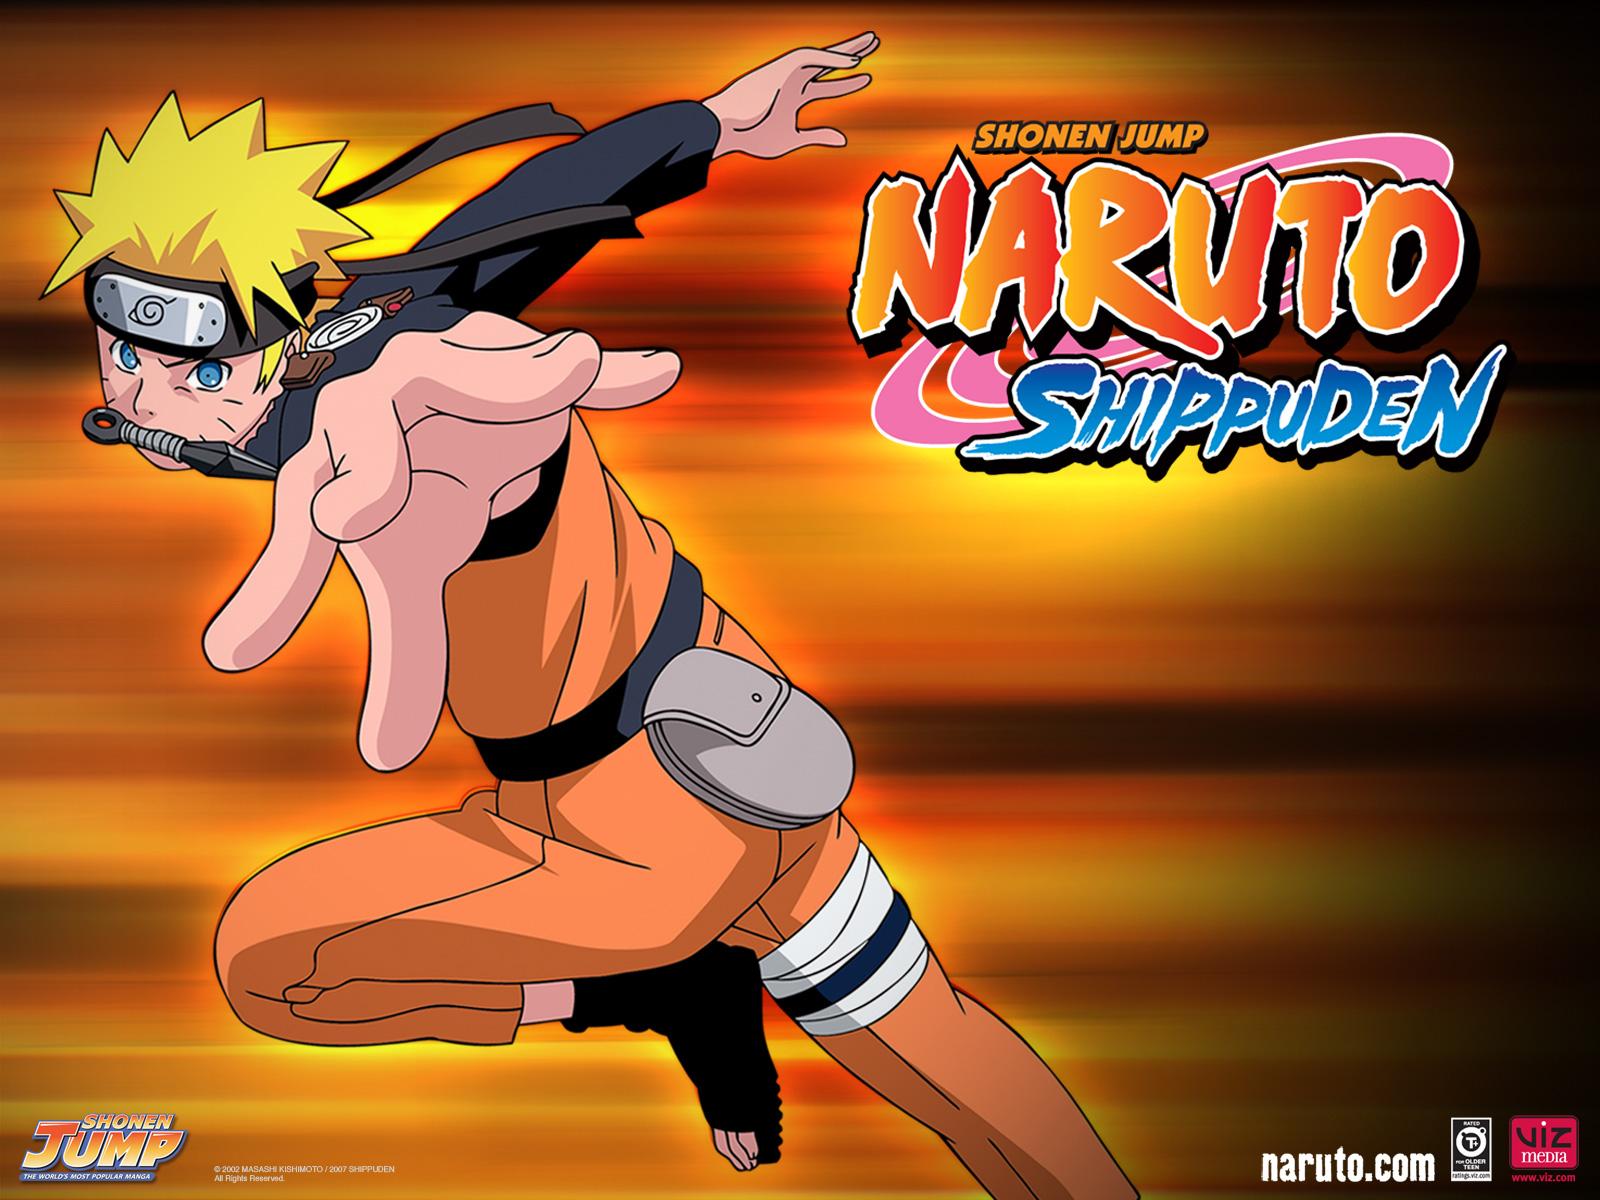 48+] Download Naruto Wallpapers on WallpaperSafari